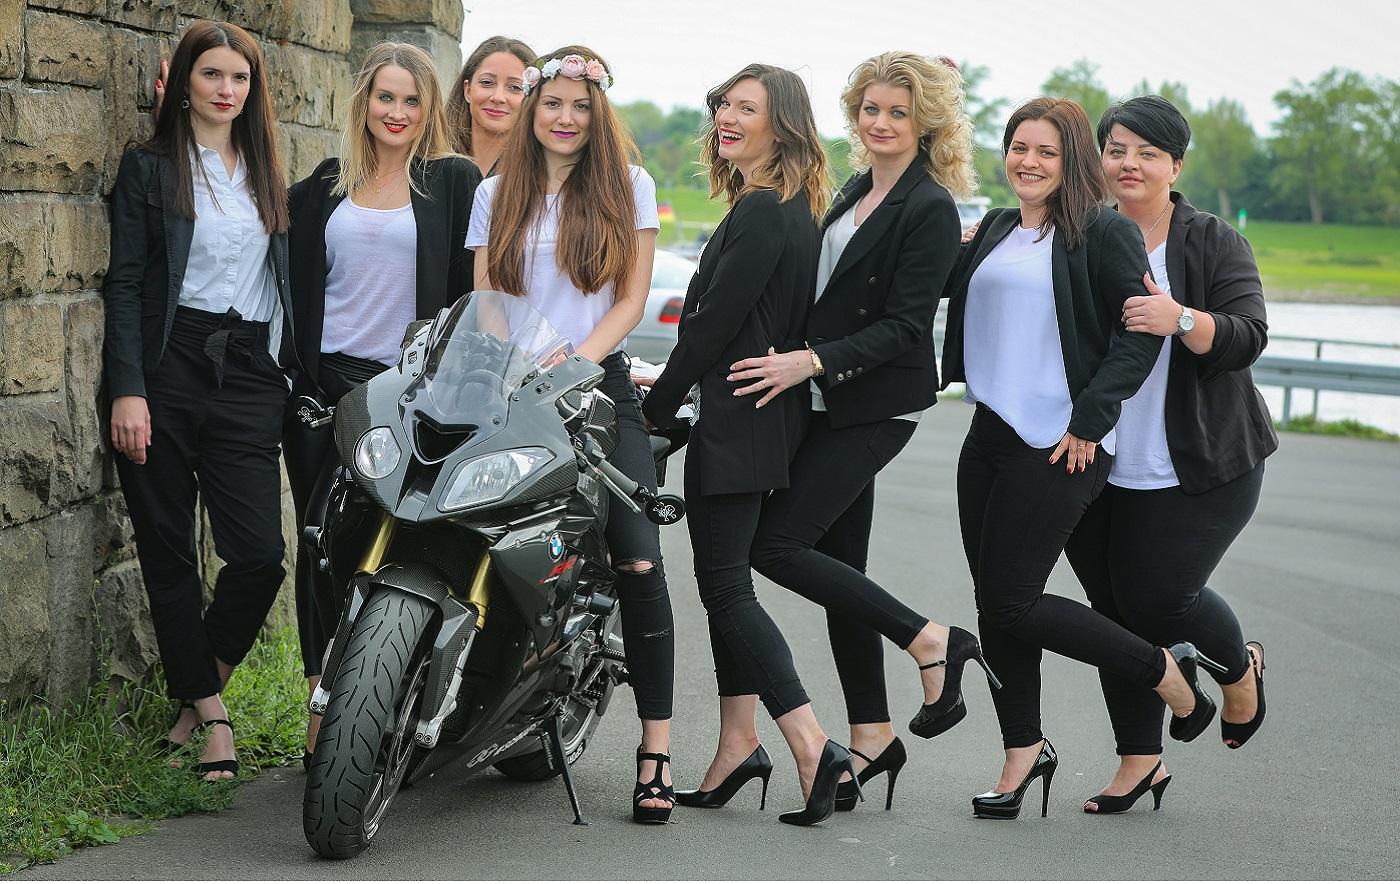 Junggesellinnenabschied Fotoshooting mit Motorrad